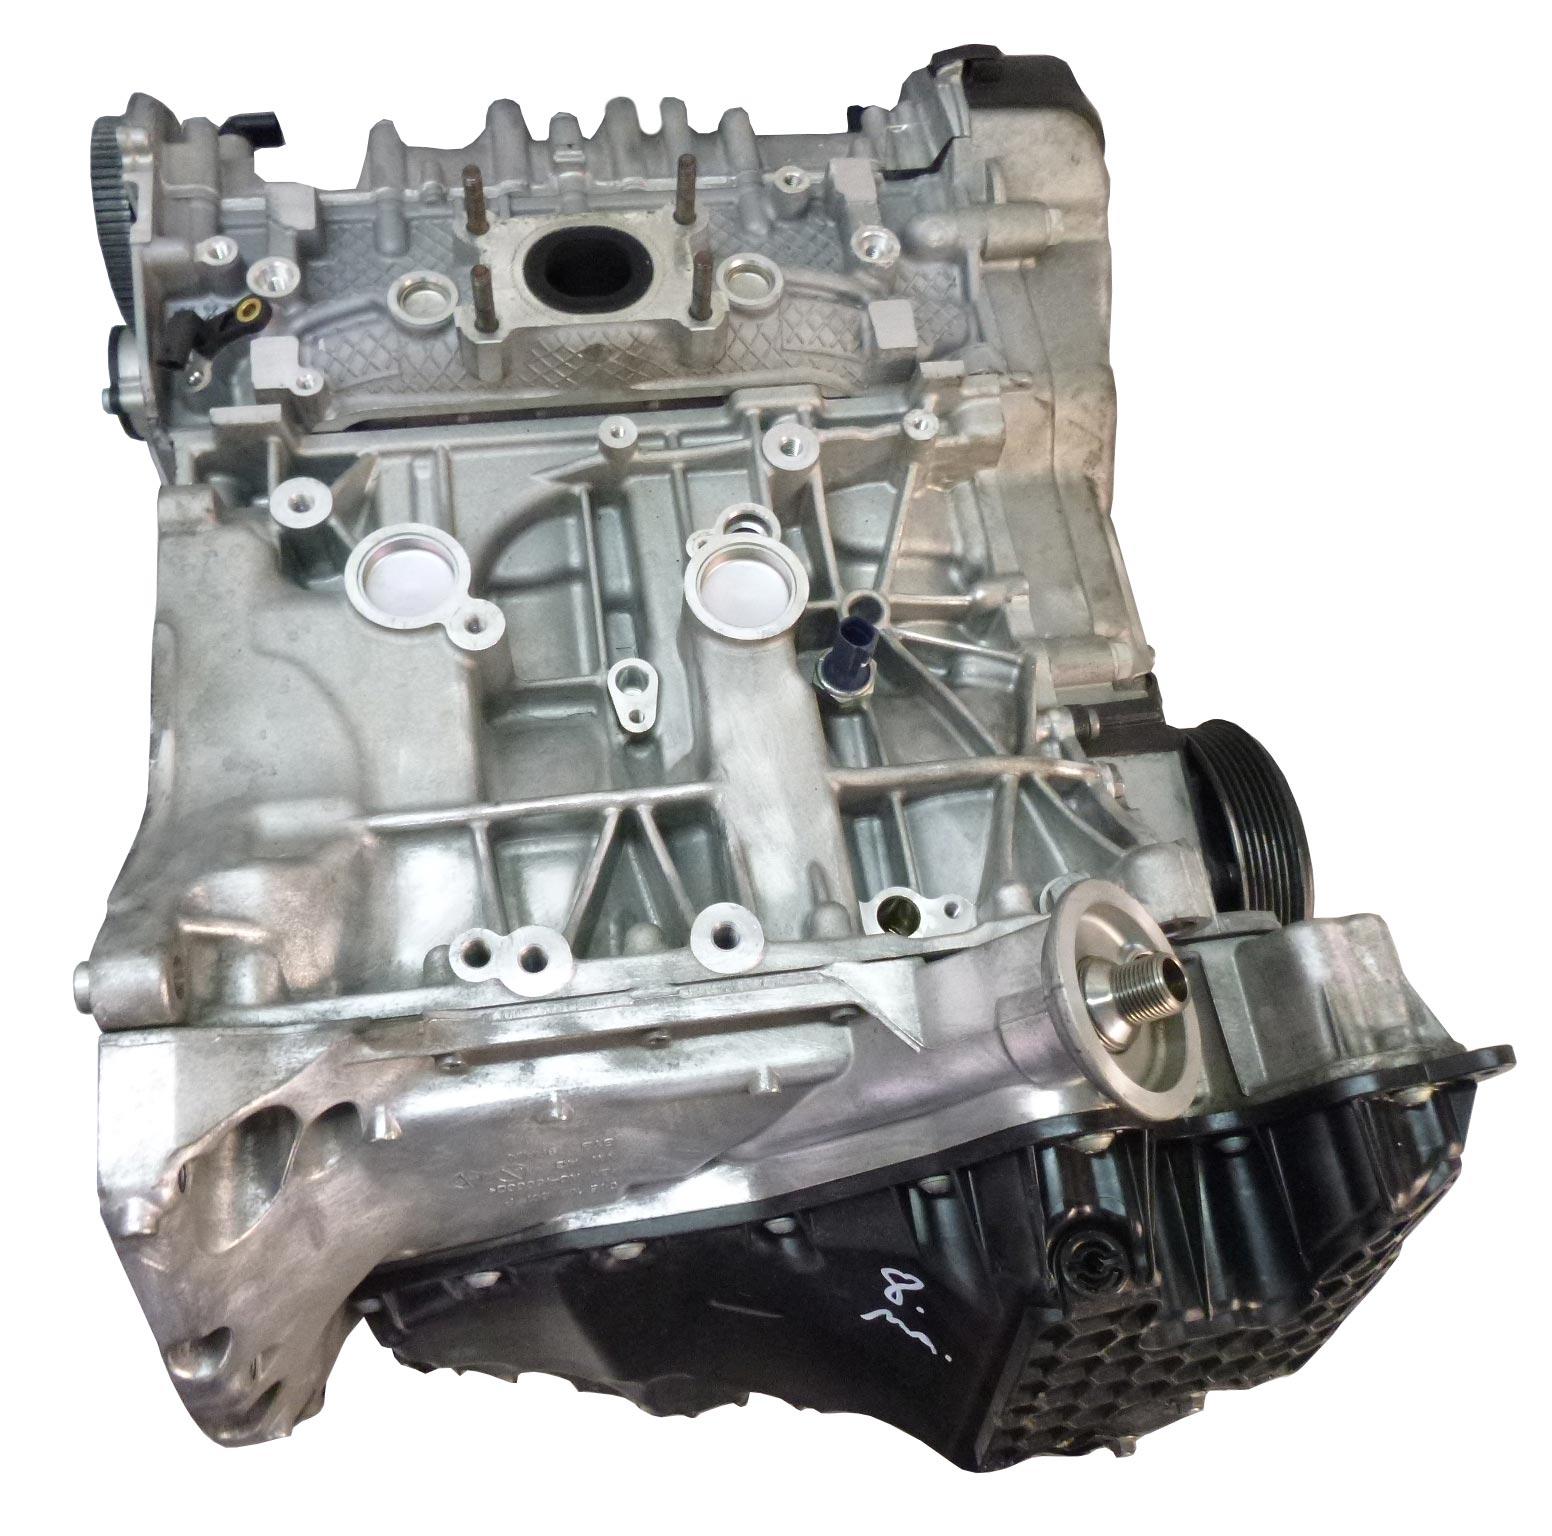 Motor Audi A4 B9 A5 F53 F5A 1,4 TFSI CVN DE297175